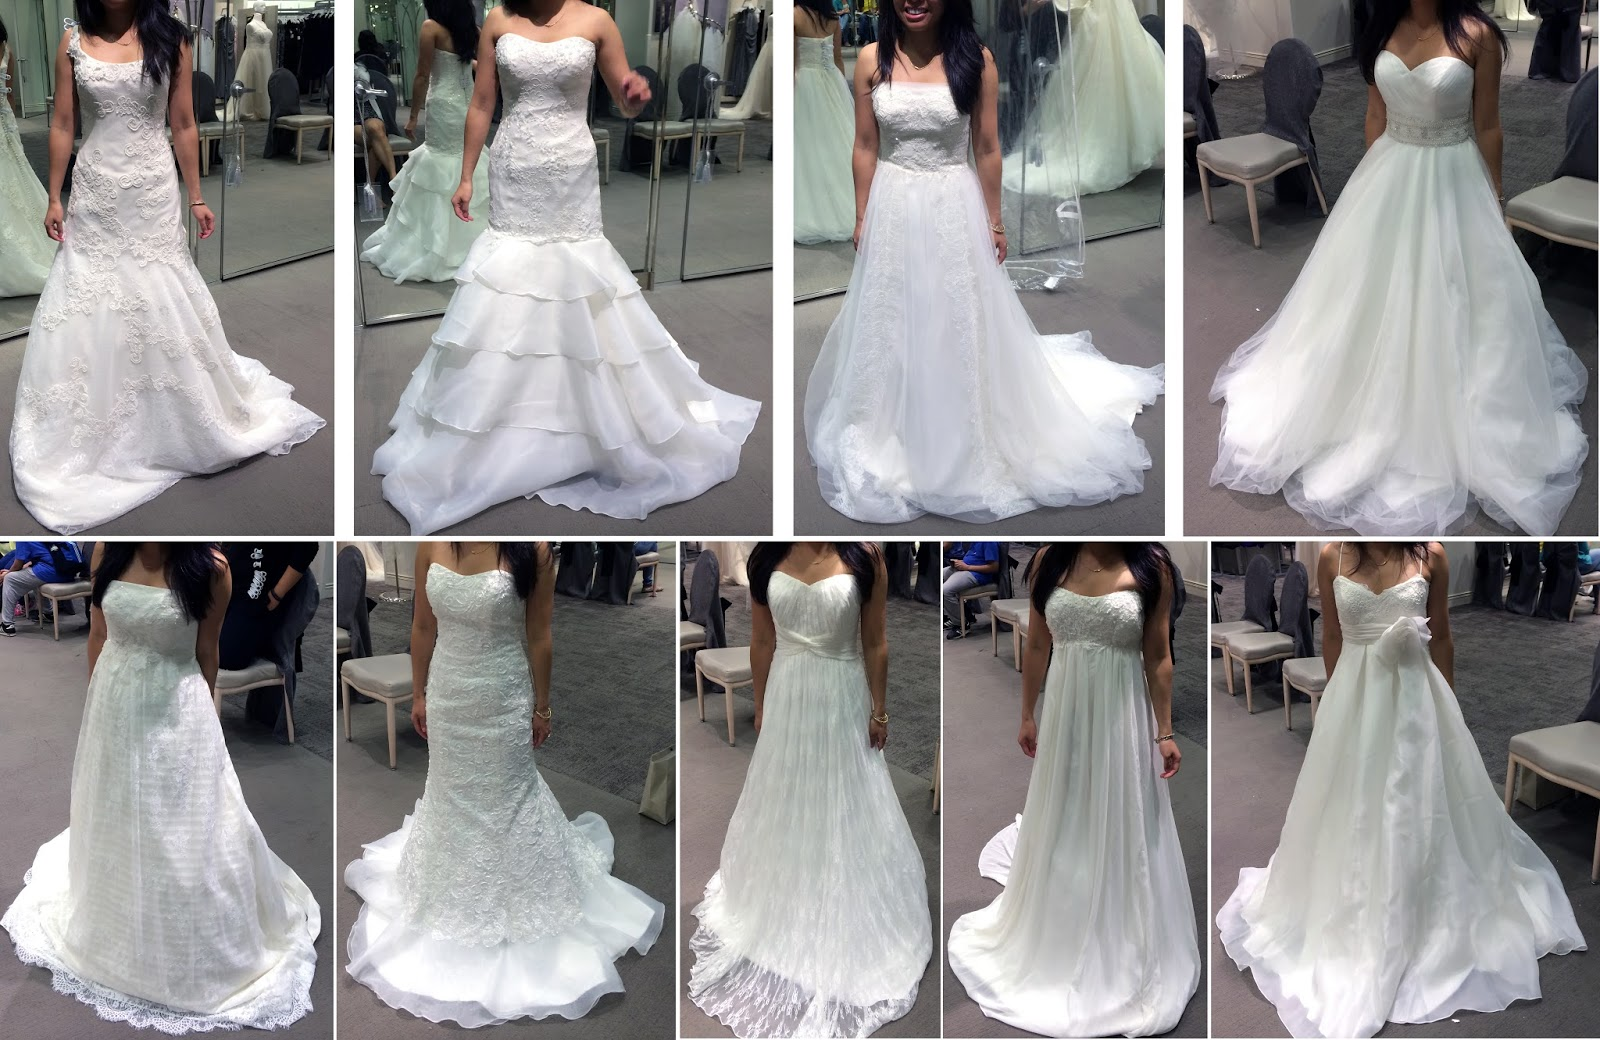 Picking The Dress David39s Bridal Kleinfeld Rk Bridal